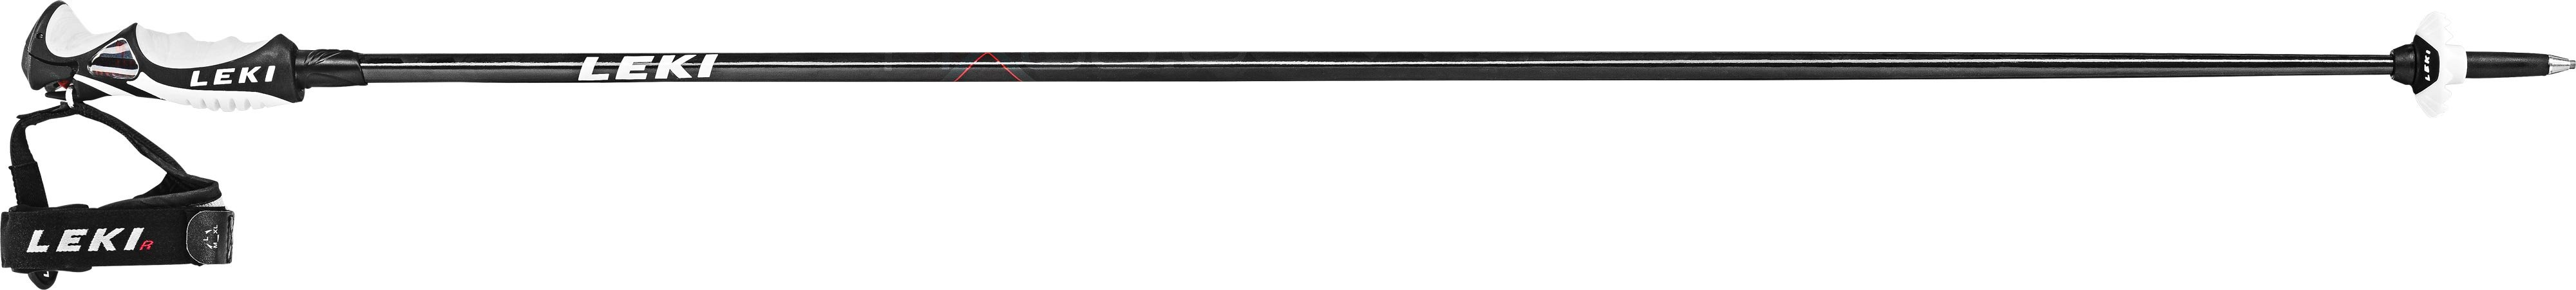 Leki Carbon HX 6.0 115